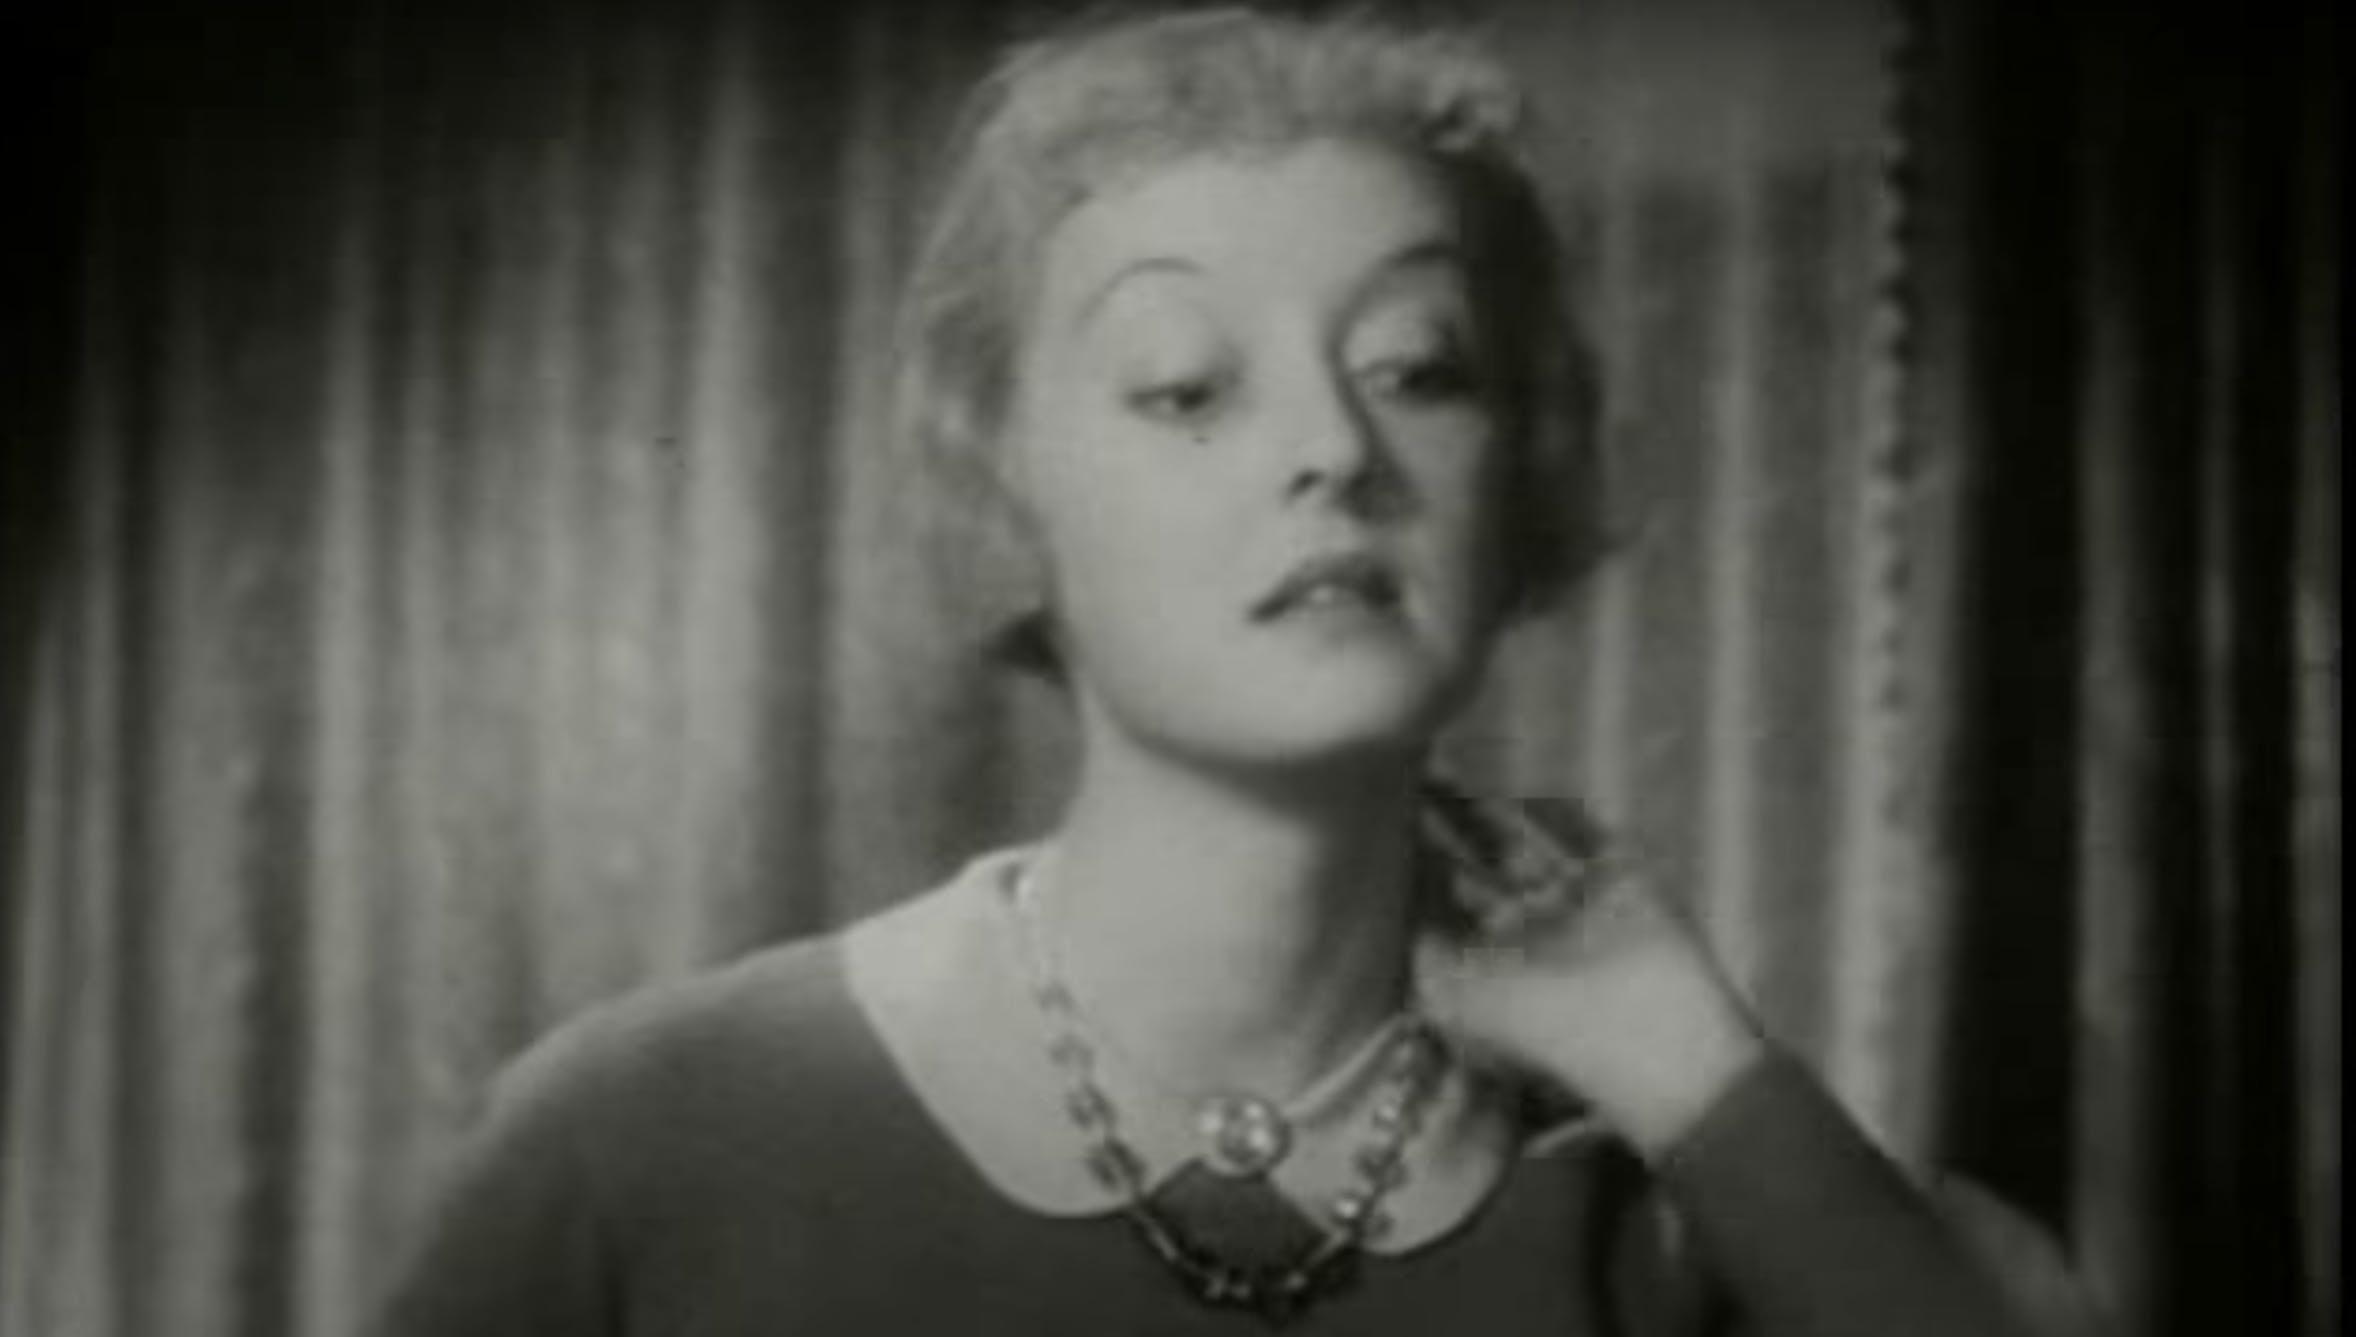 old movies on amazon prime : of human bondage